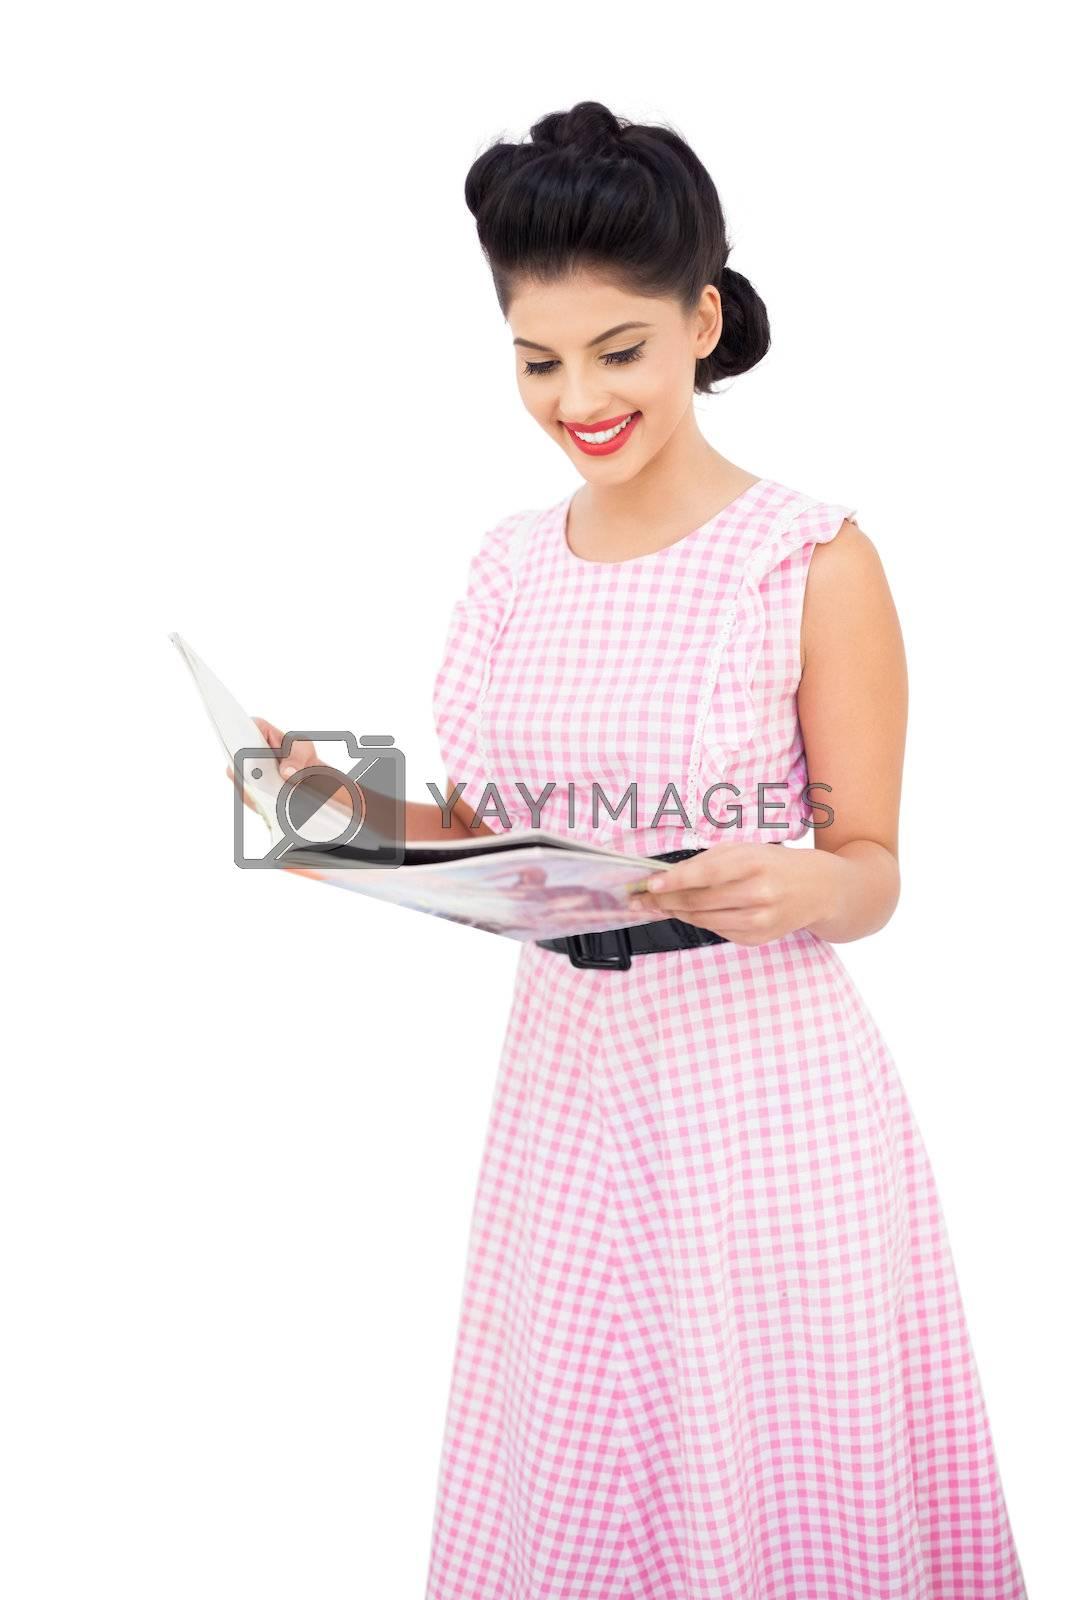 Smiling black hair model reading a magazine by Wavebreakmedia